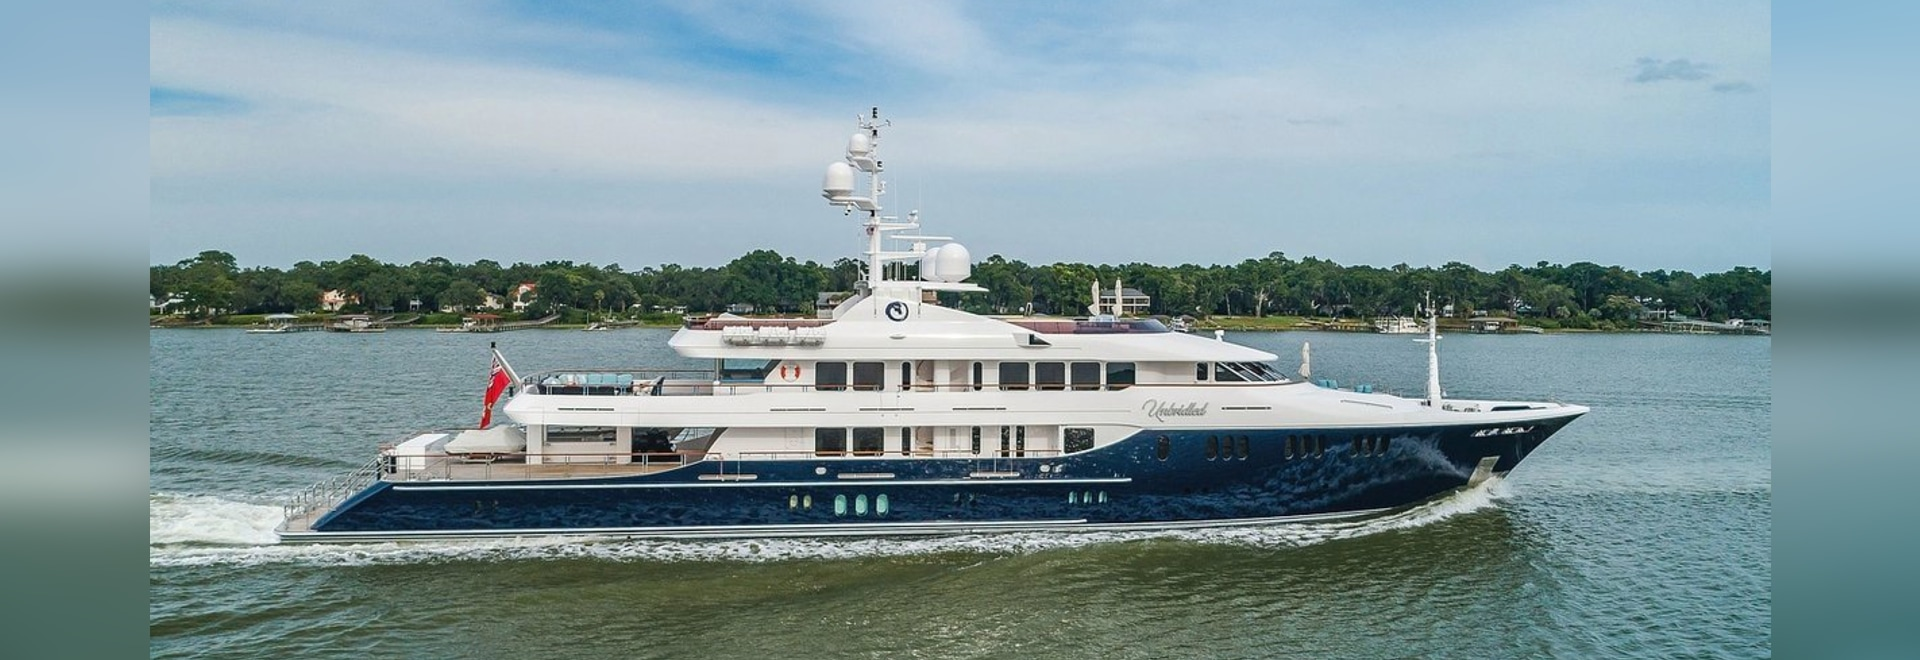 58m Trinity yacht Senza freni sul mercato